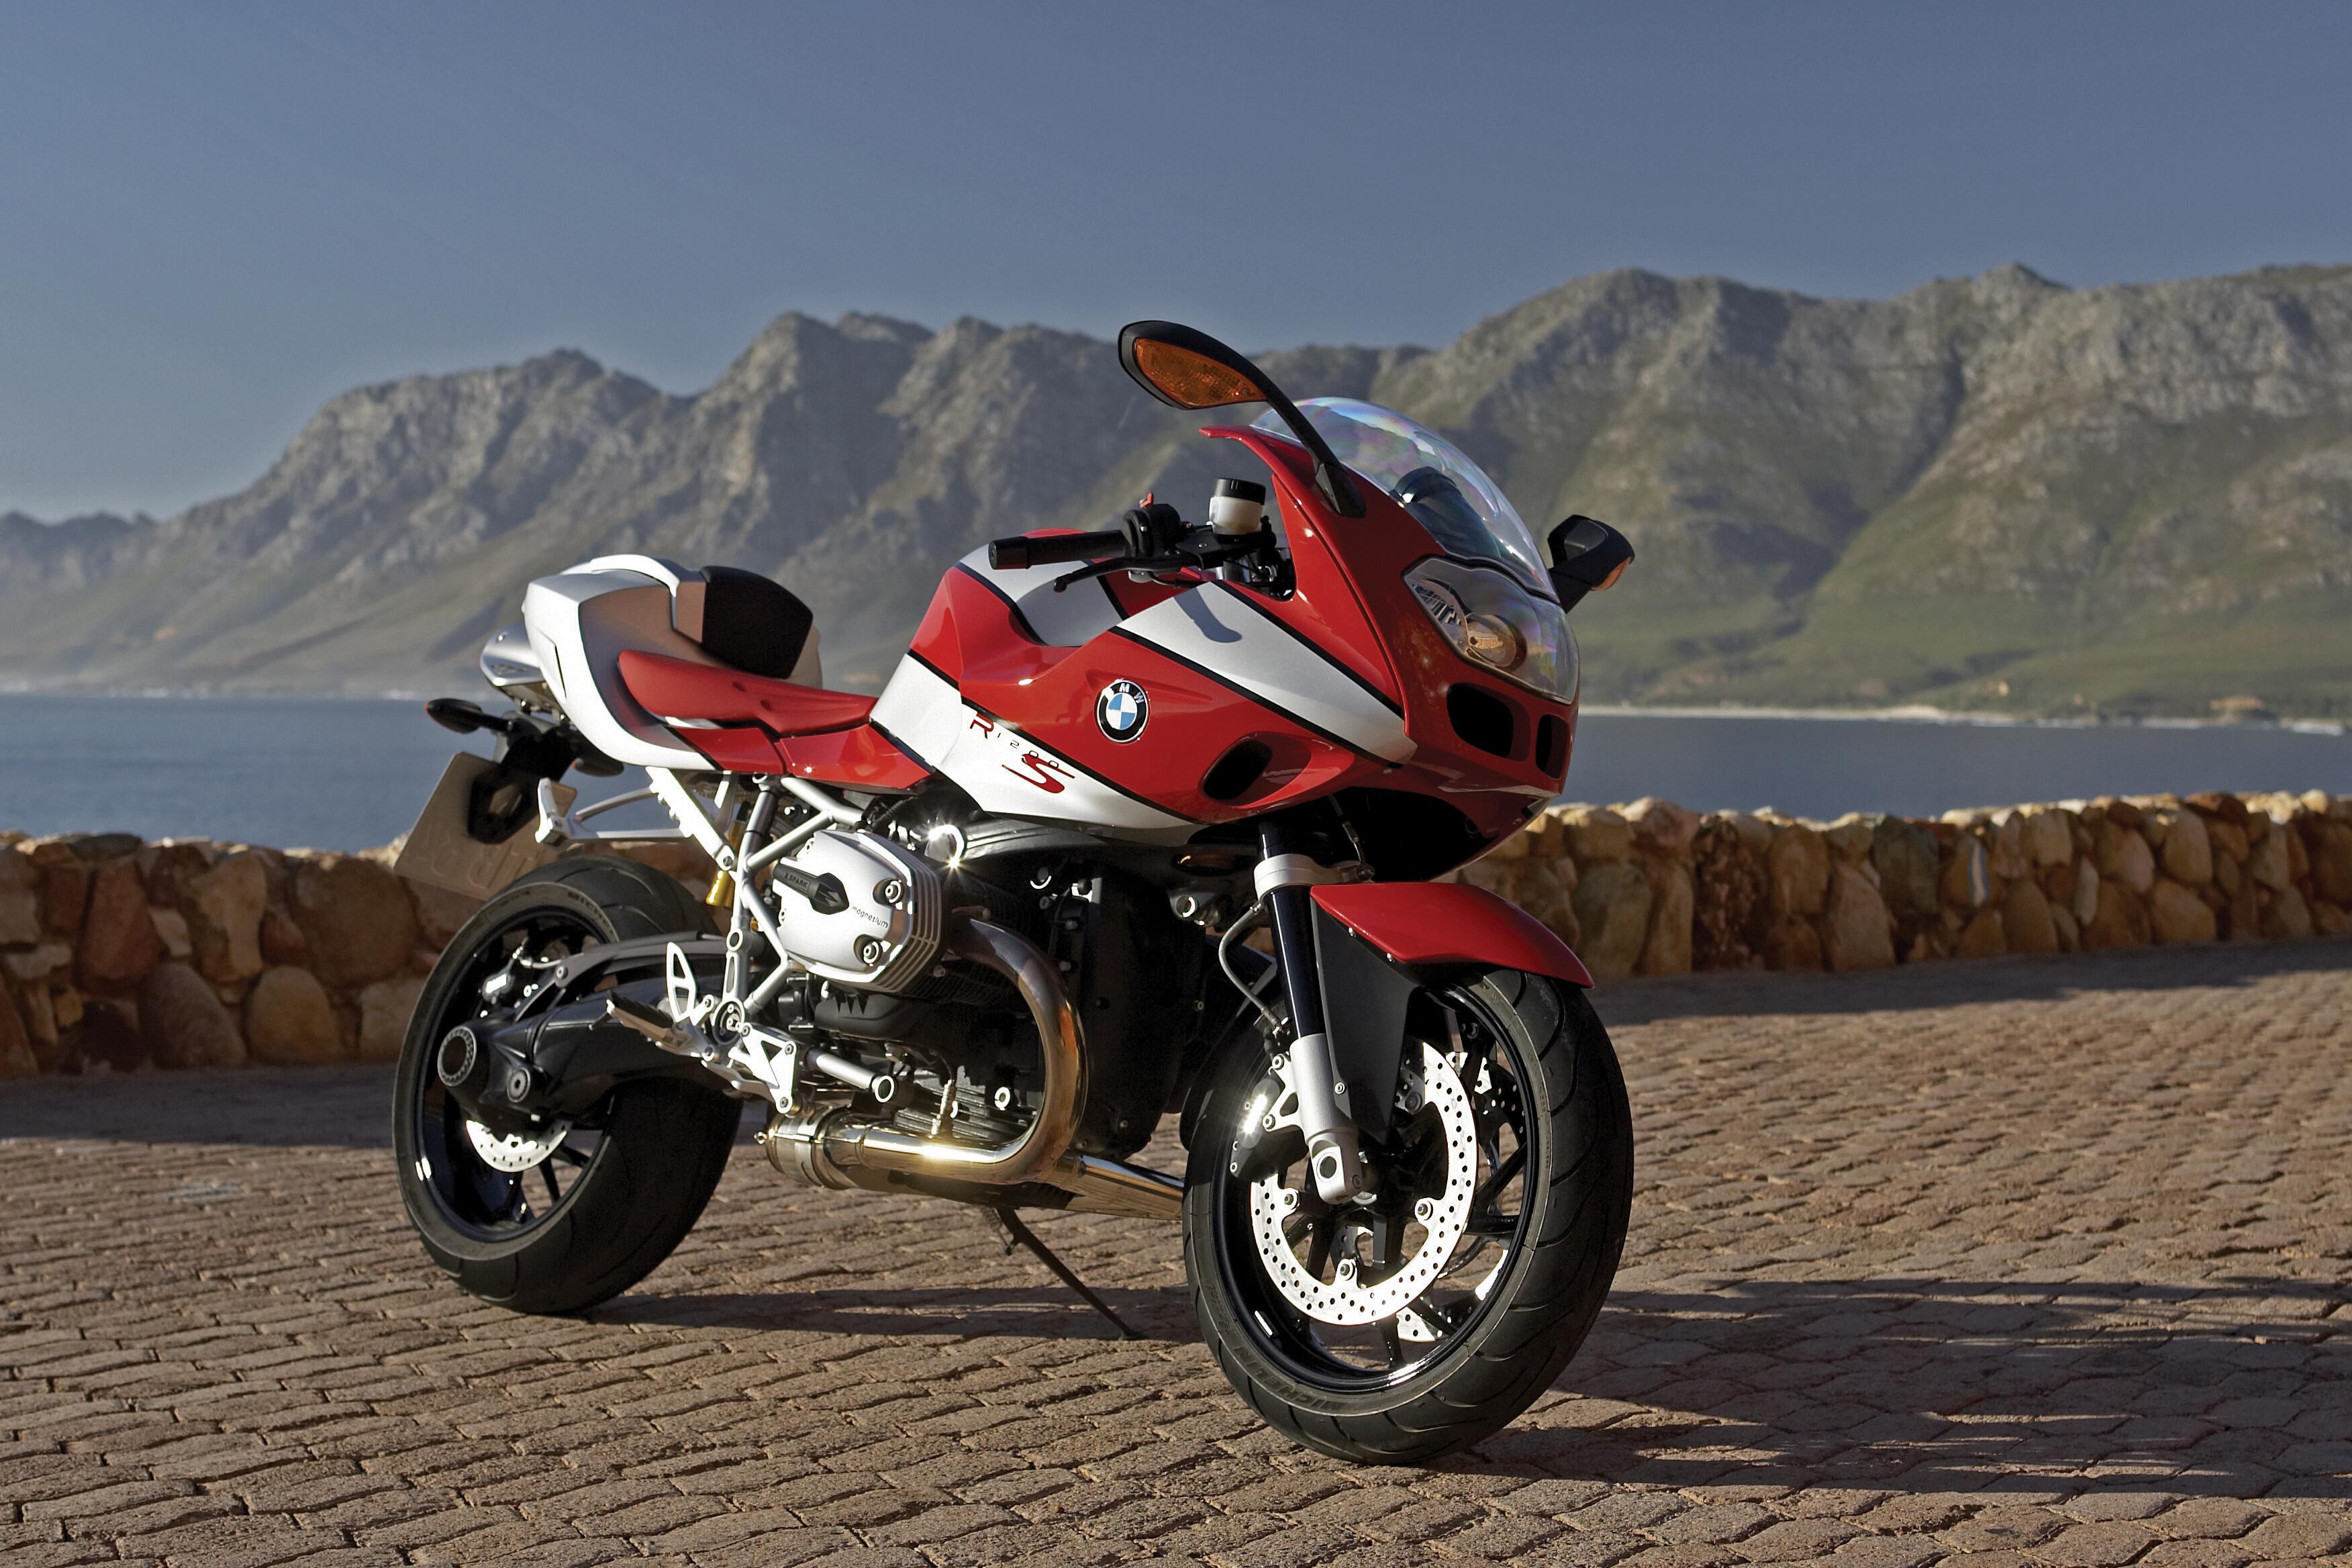 Картинки BMW - Мотоциклы 2004-06 R 1200 S Мотоциклы БМВ мотоцикл